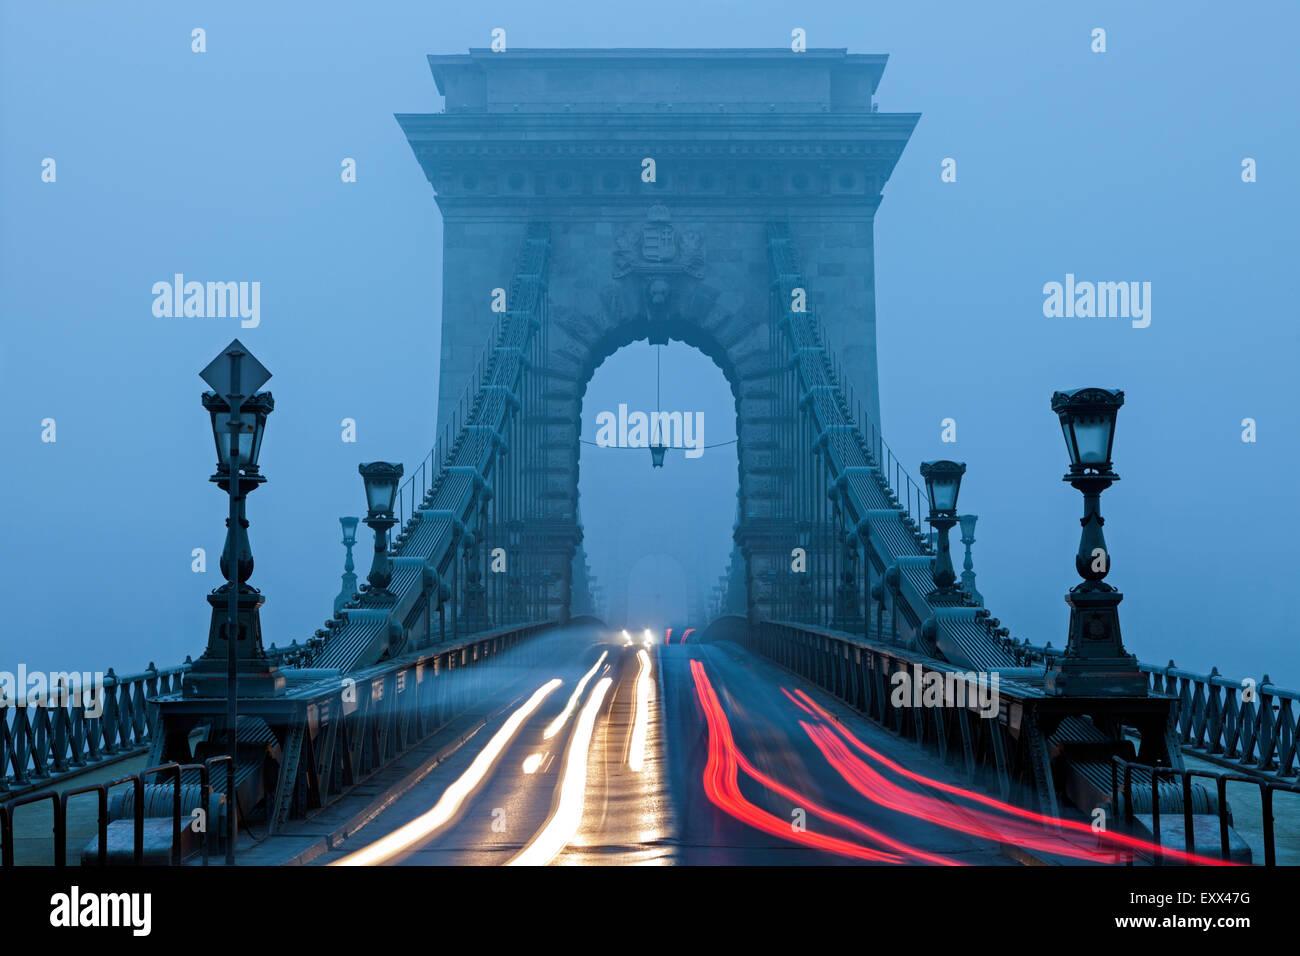 Light trails on Chain Bridge - Stock Image